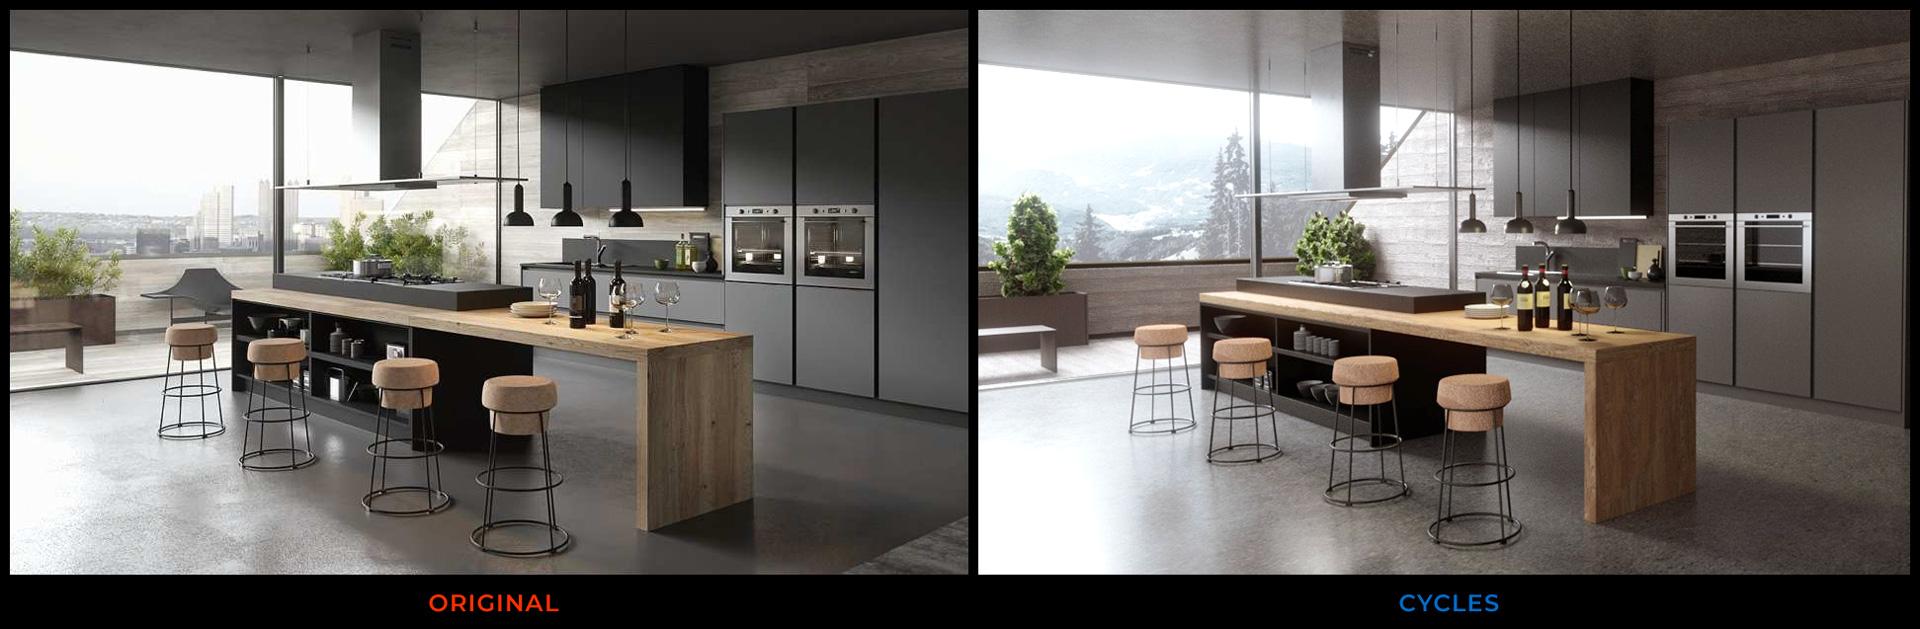 Architectural Interiors in EEVEE Tutorial series - Tutorials